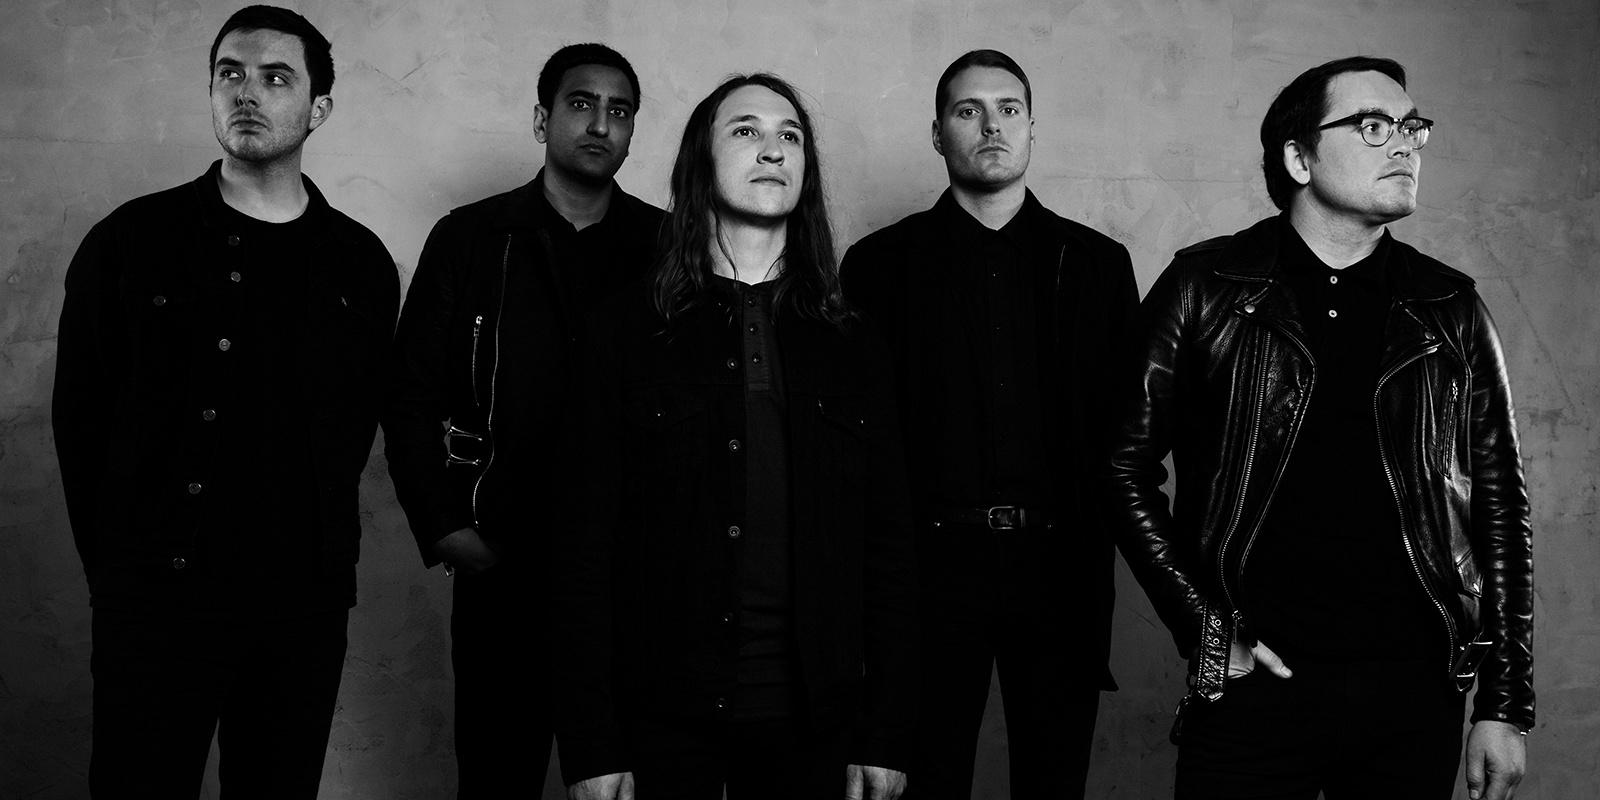 Deafheaven teases new album